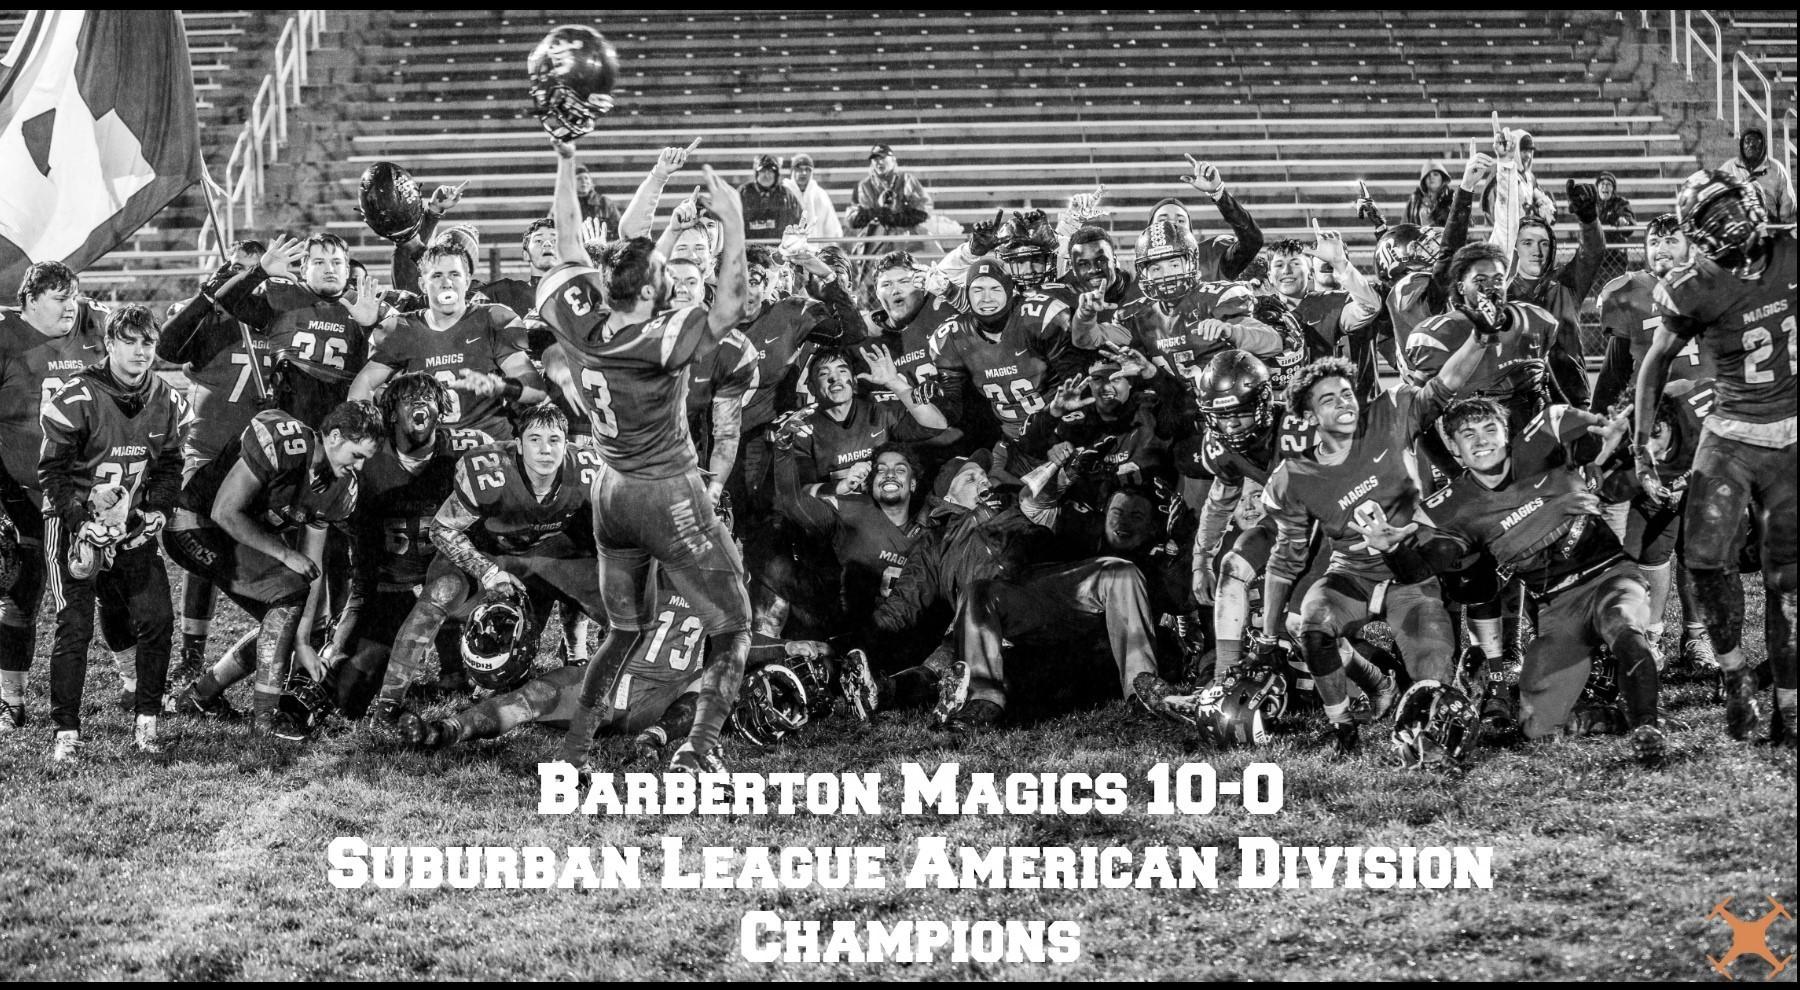 Barberton Magics 10-0 Suburban League American Division Champions